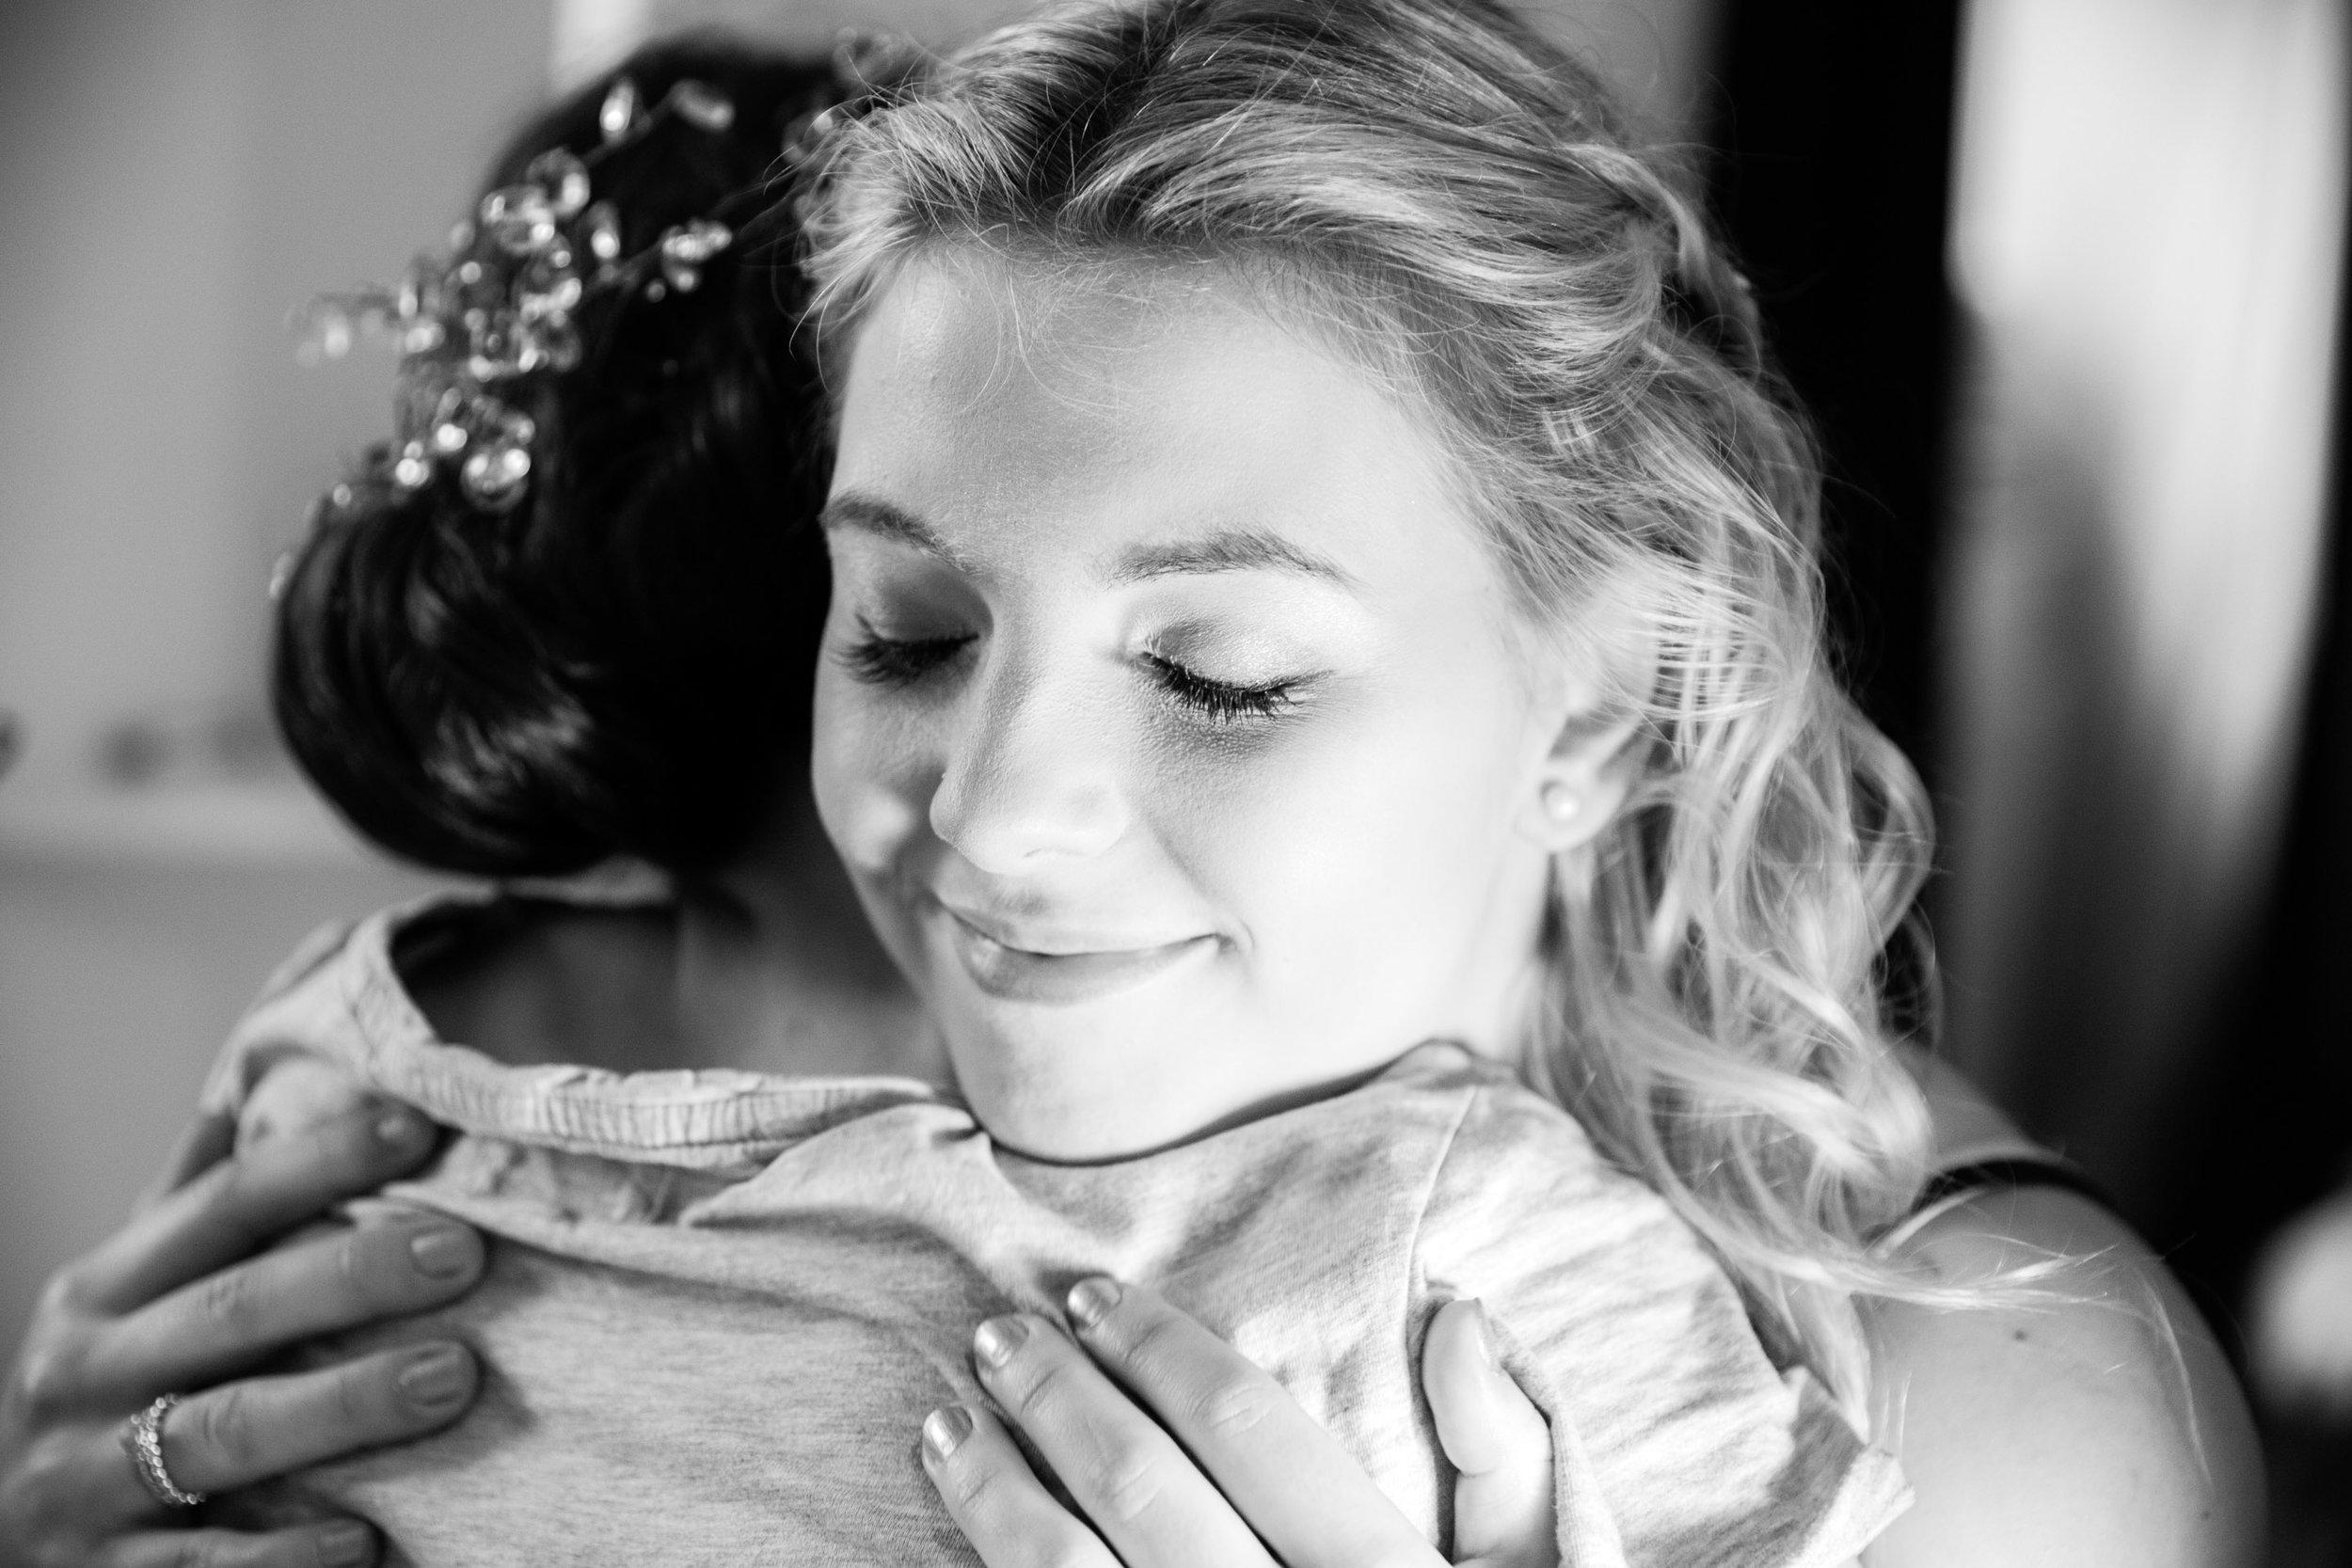 Jess & Ben - Bristol Wedding Photographer - Wright Wedding Photography - 23